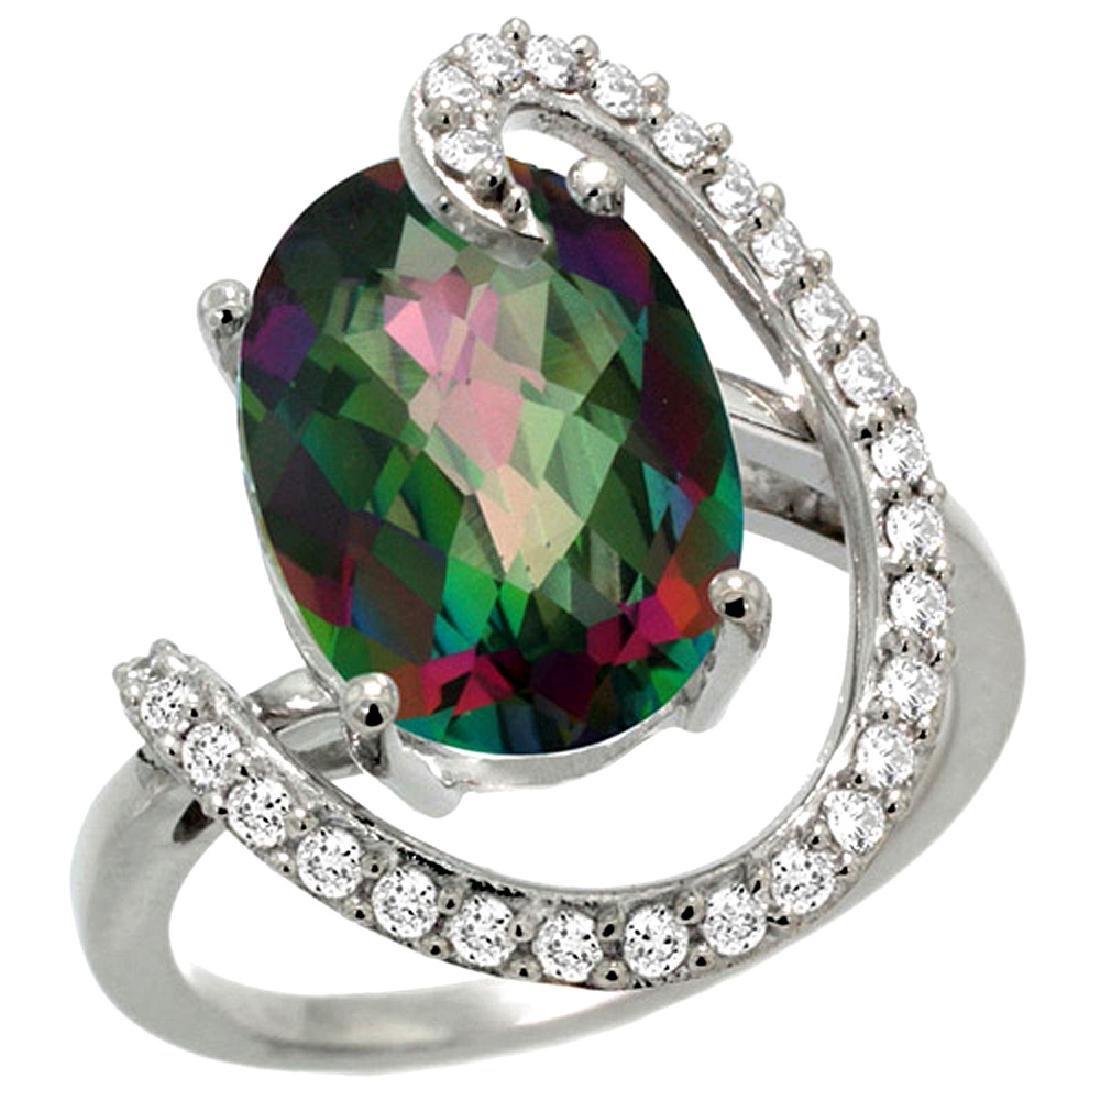 Natural 5.89 ctw Mystic-topaz & Diamond Engagement Ring